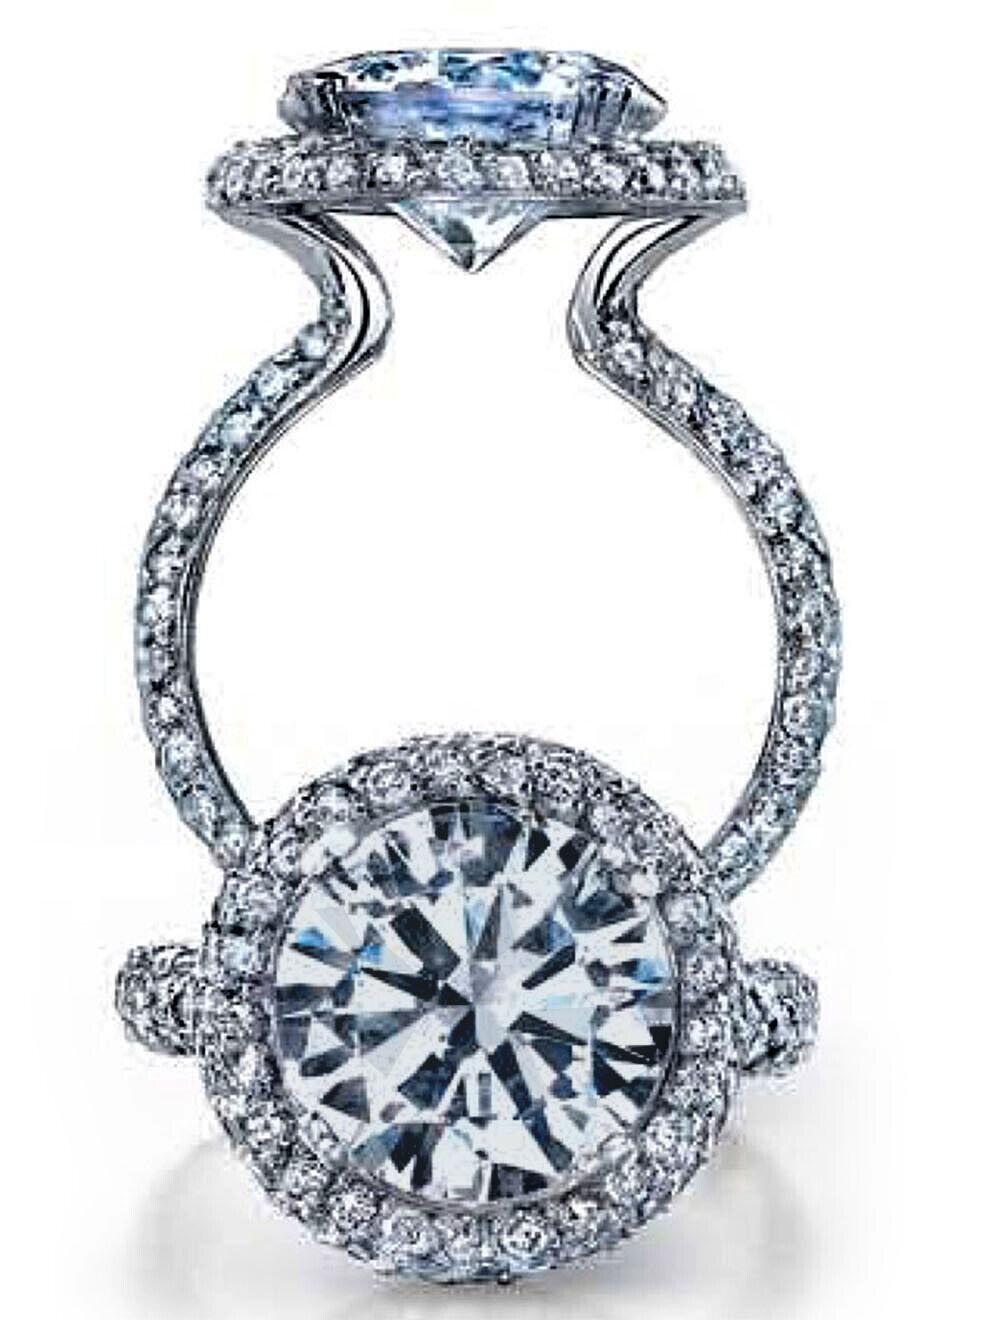 Unique Halo Design 1.60 TCW Round Cut Eternity Diamond Engagement Ring - GIA